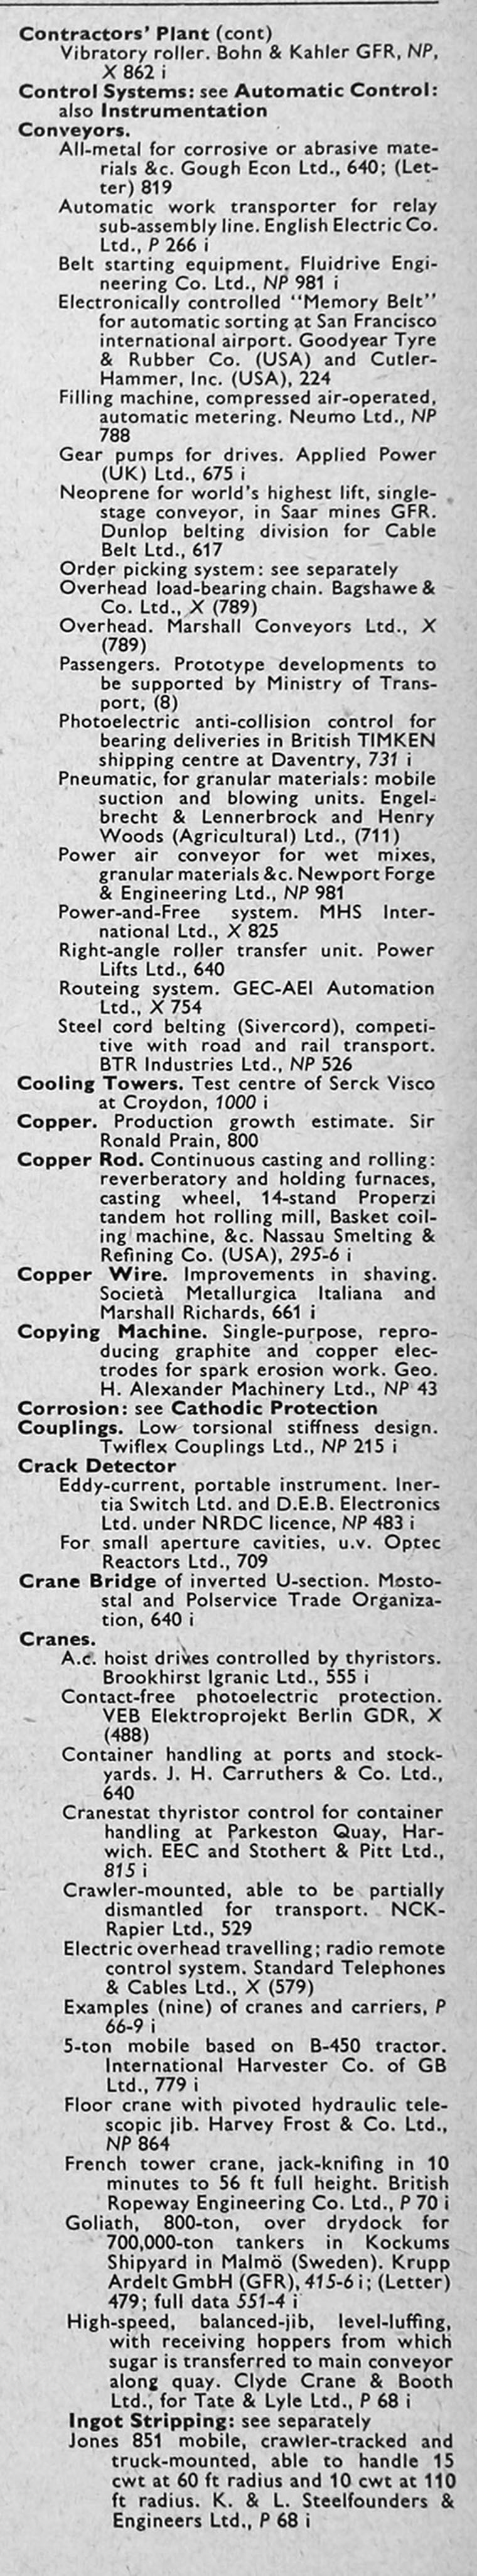 The Engineer 1968 Jan-Jun: Index